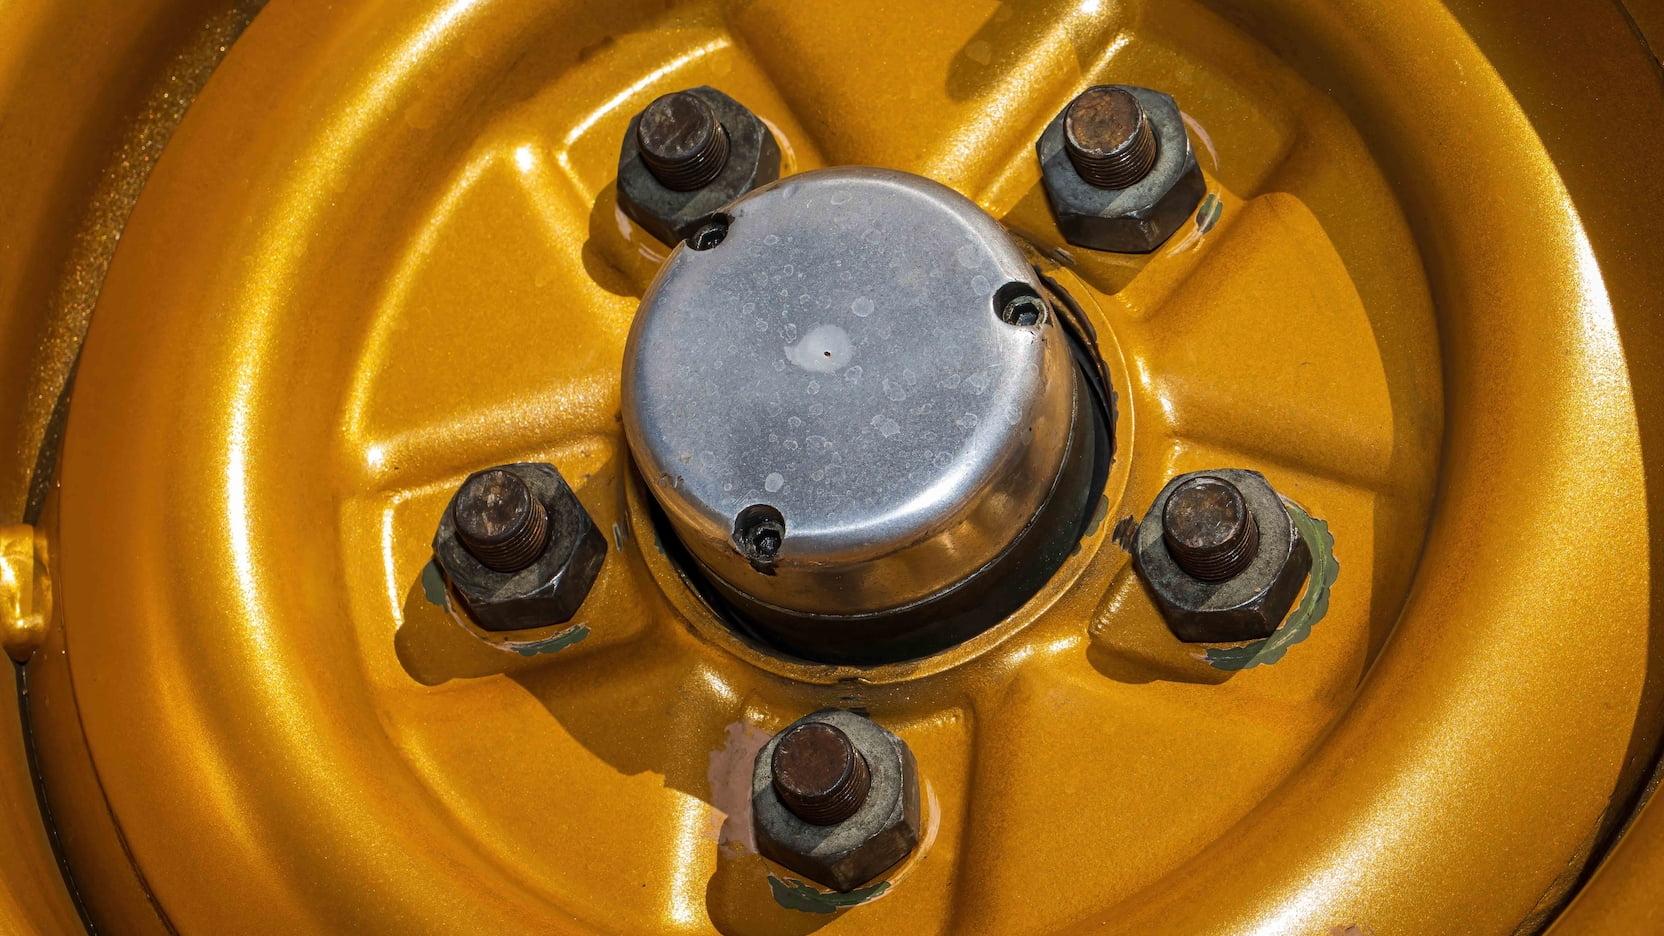 1967 Ford Mustang Holman-Moody Racer wheel hub detail